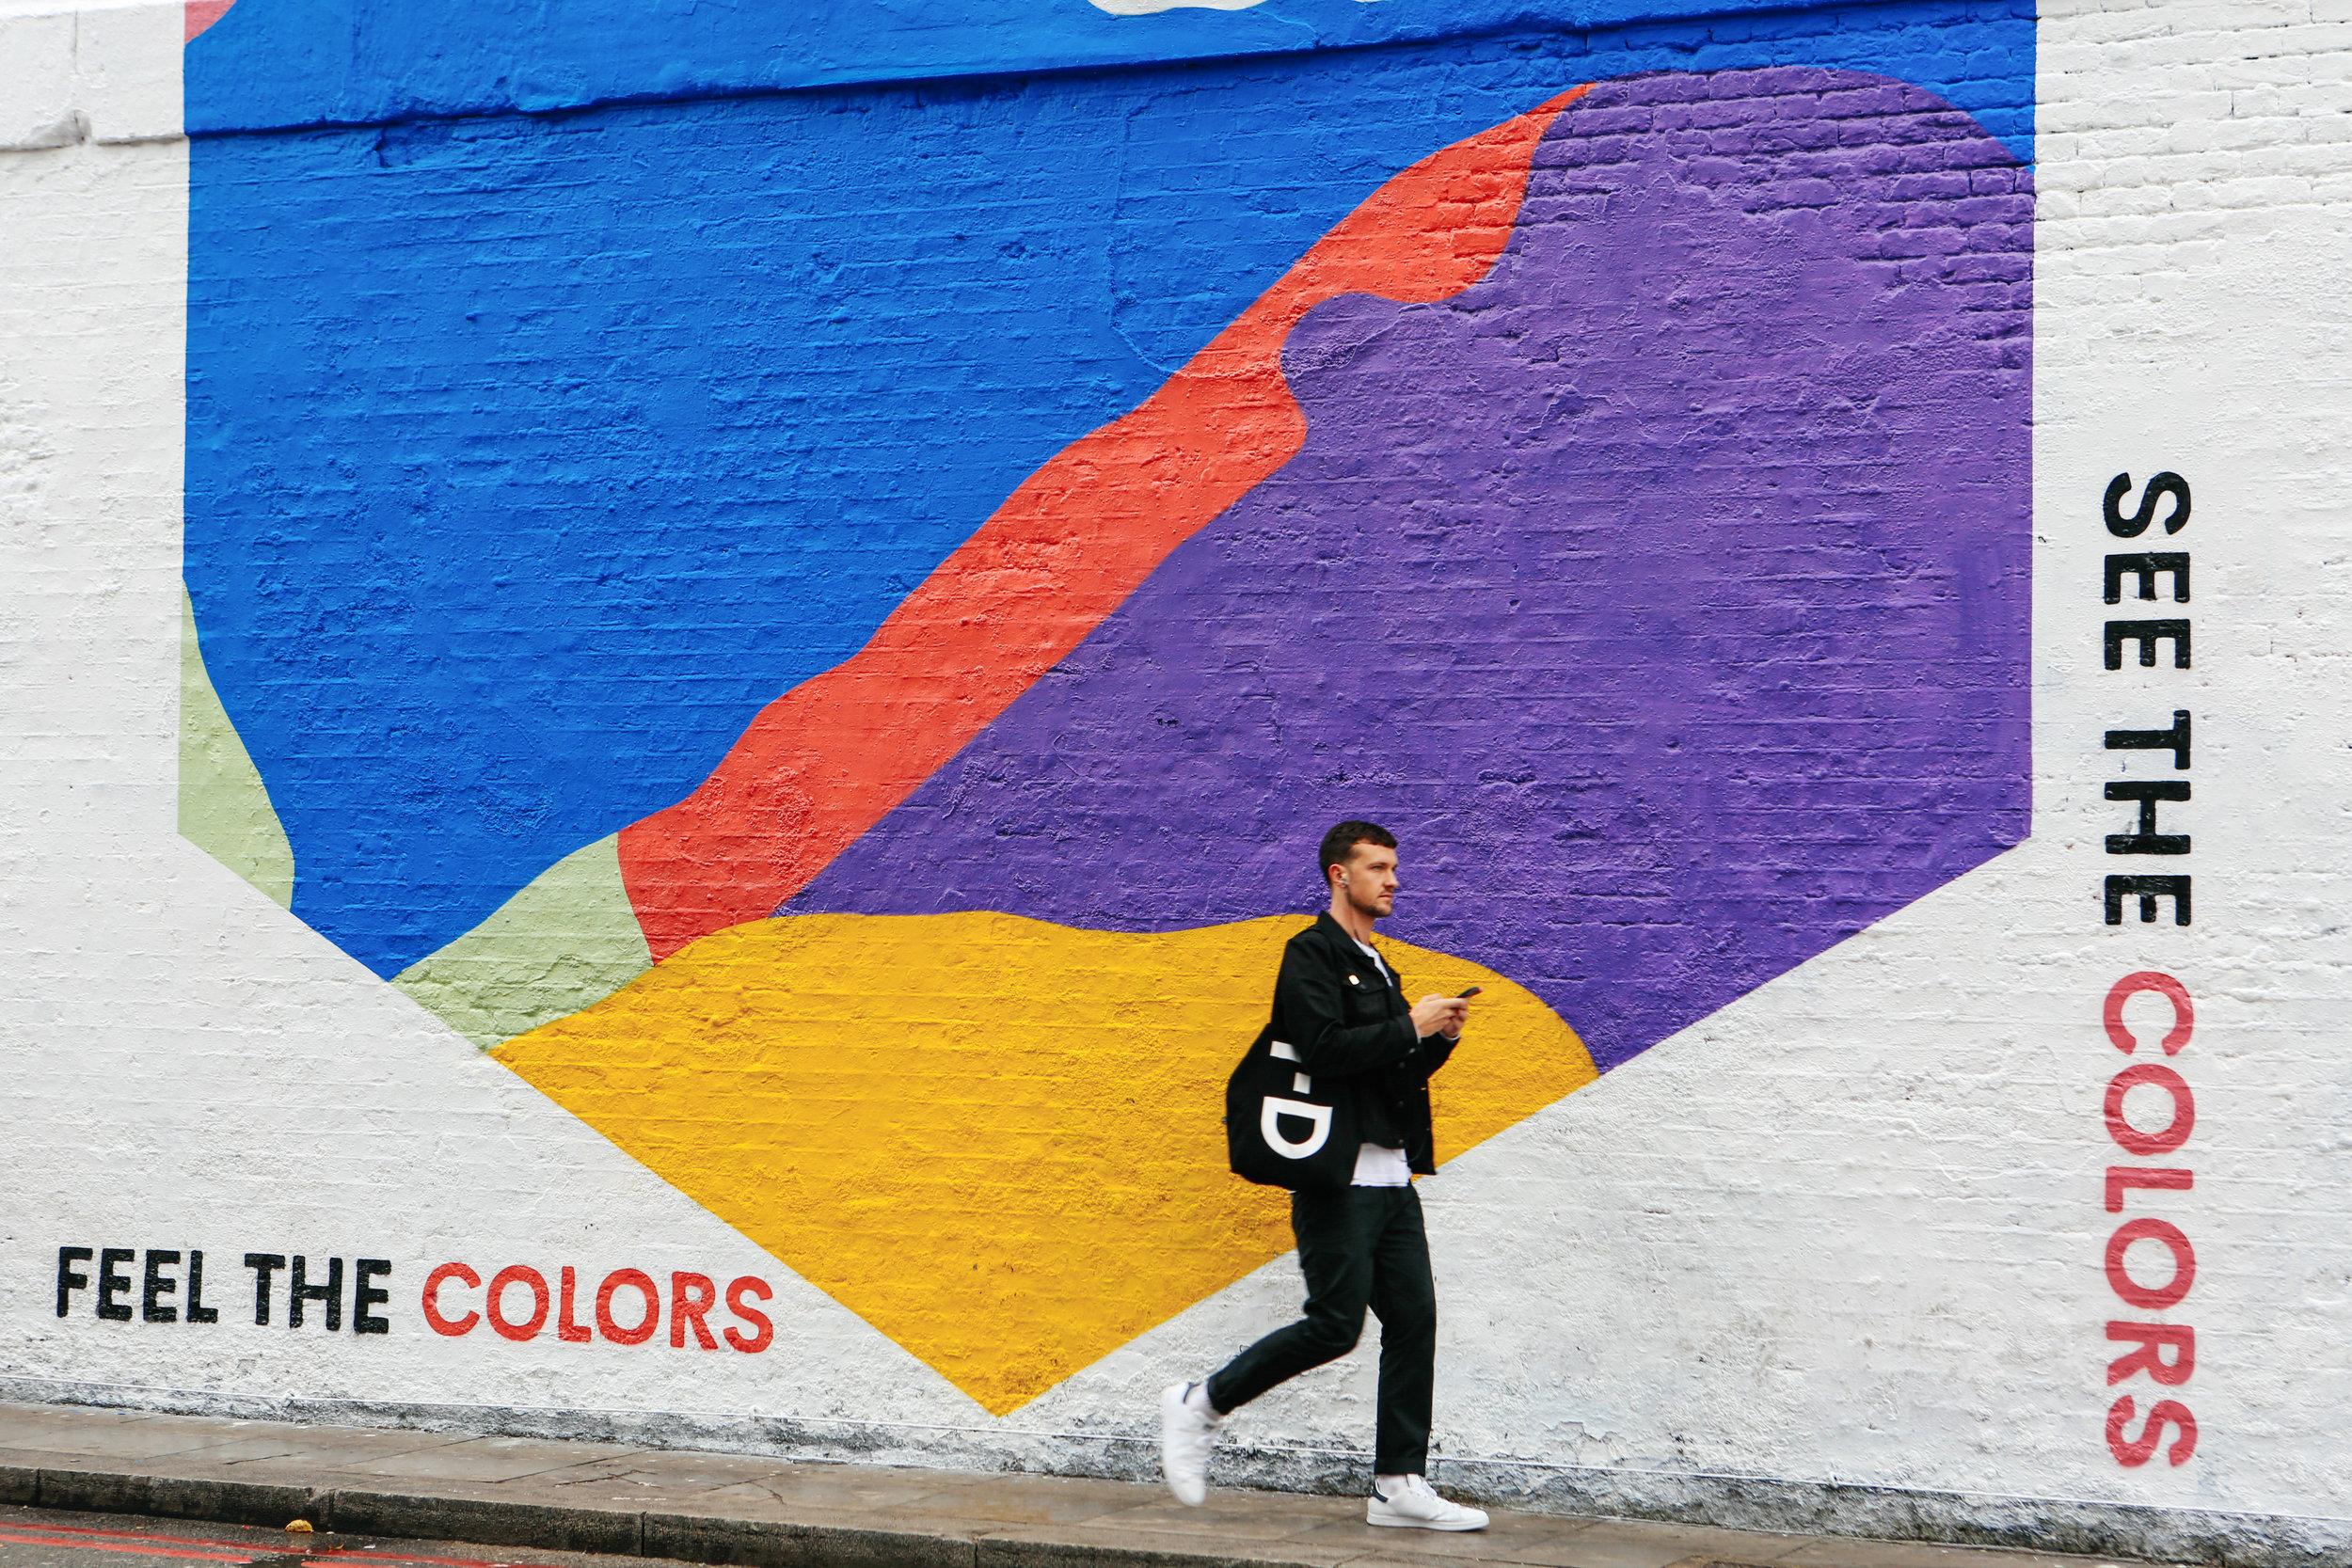 colourful-street-art_48364856172_o.jpg